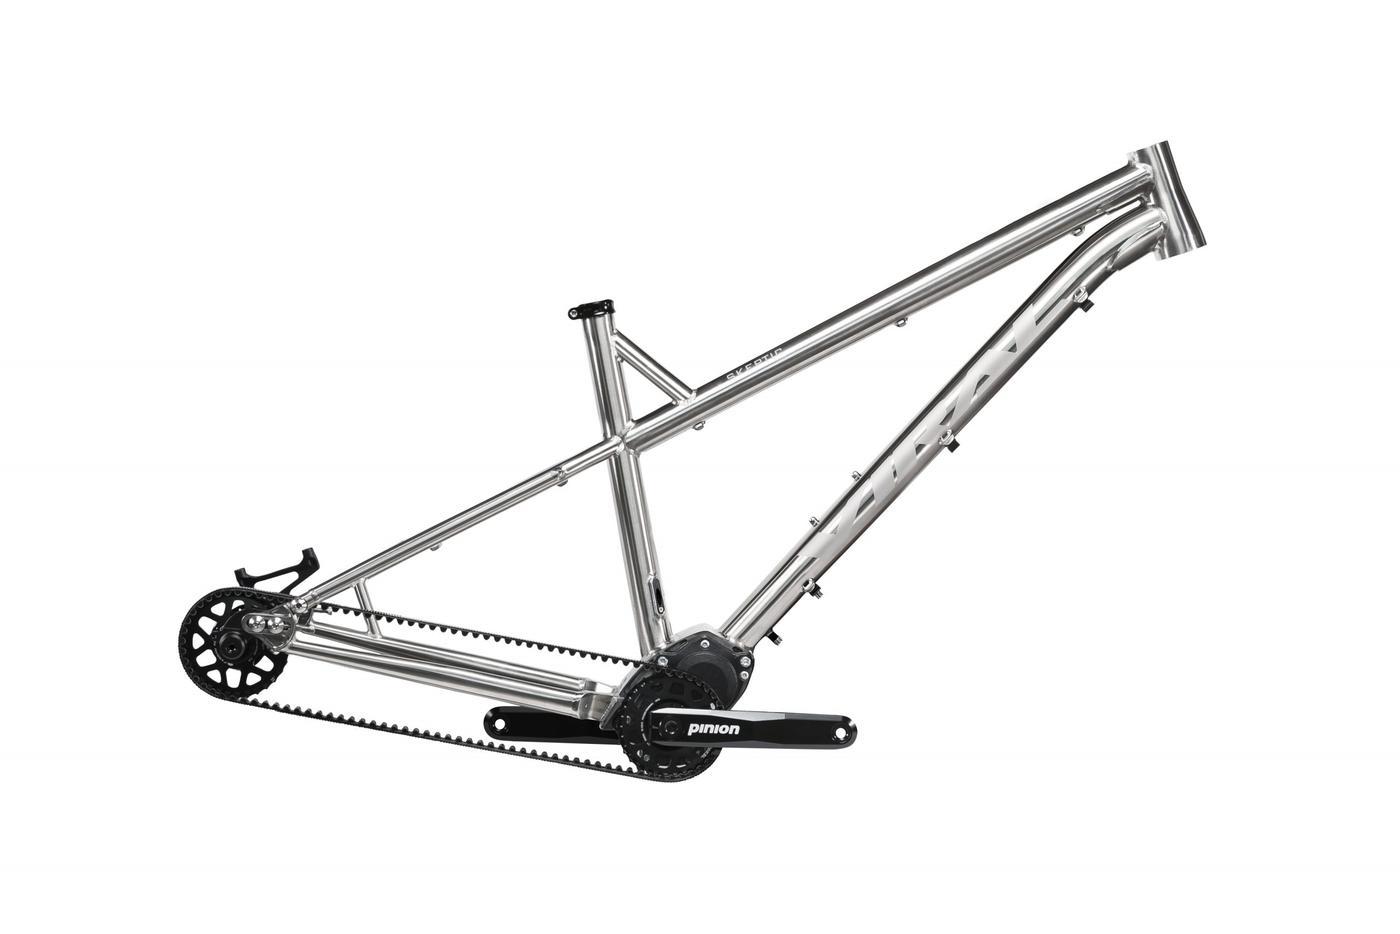 Viral Bikes Update Skeptic Geometry and Increase Dérive's Reach